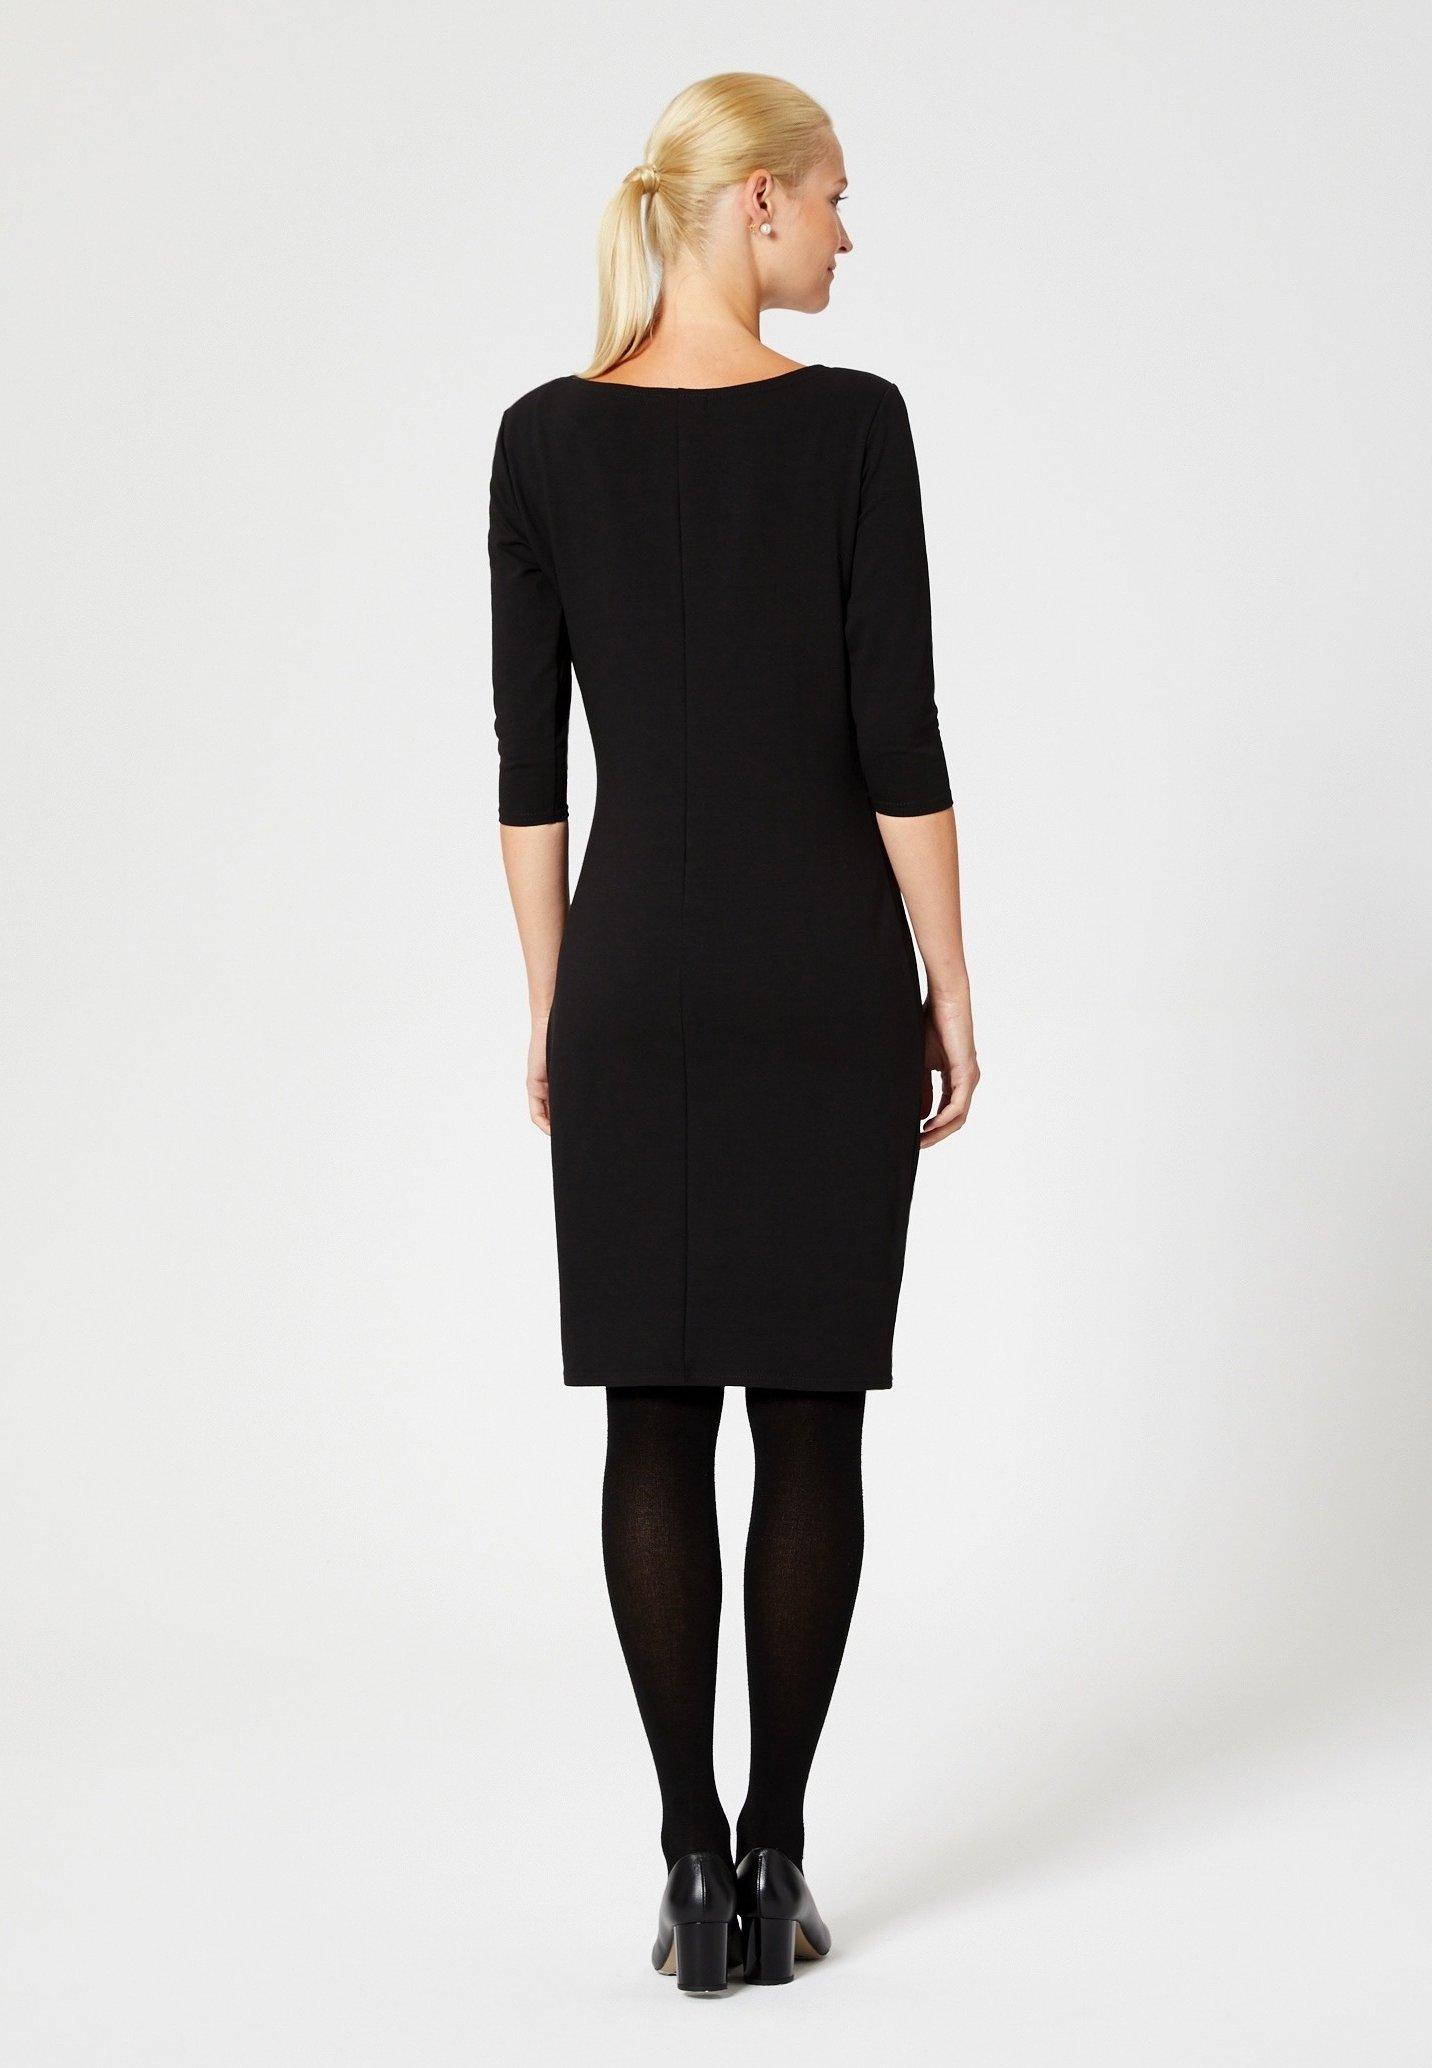 Online Shopping Women's Clothing usha Jersey dress black HZP0FpWRV